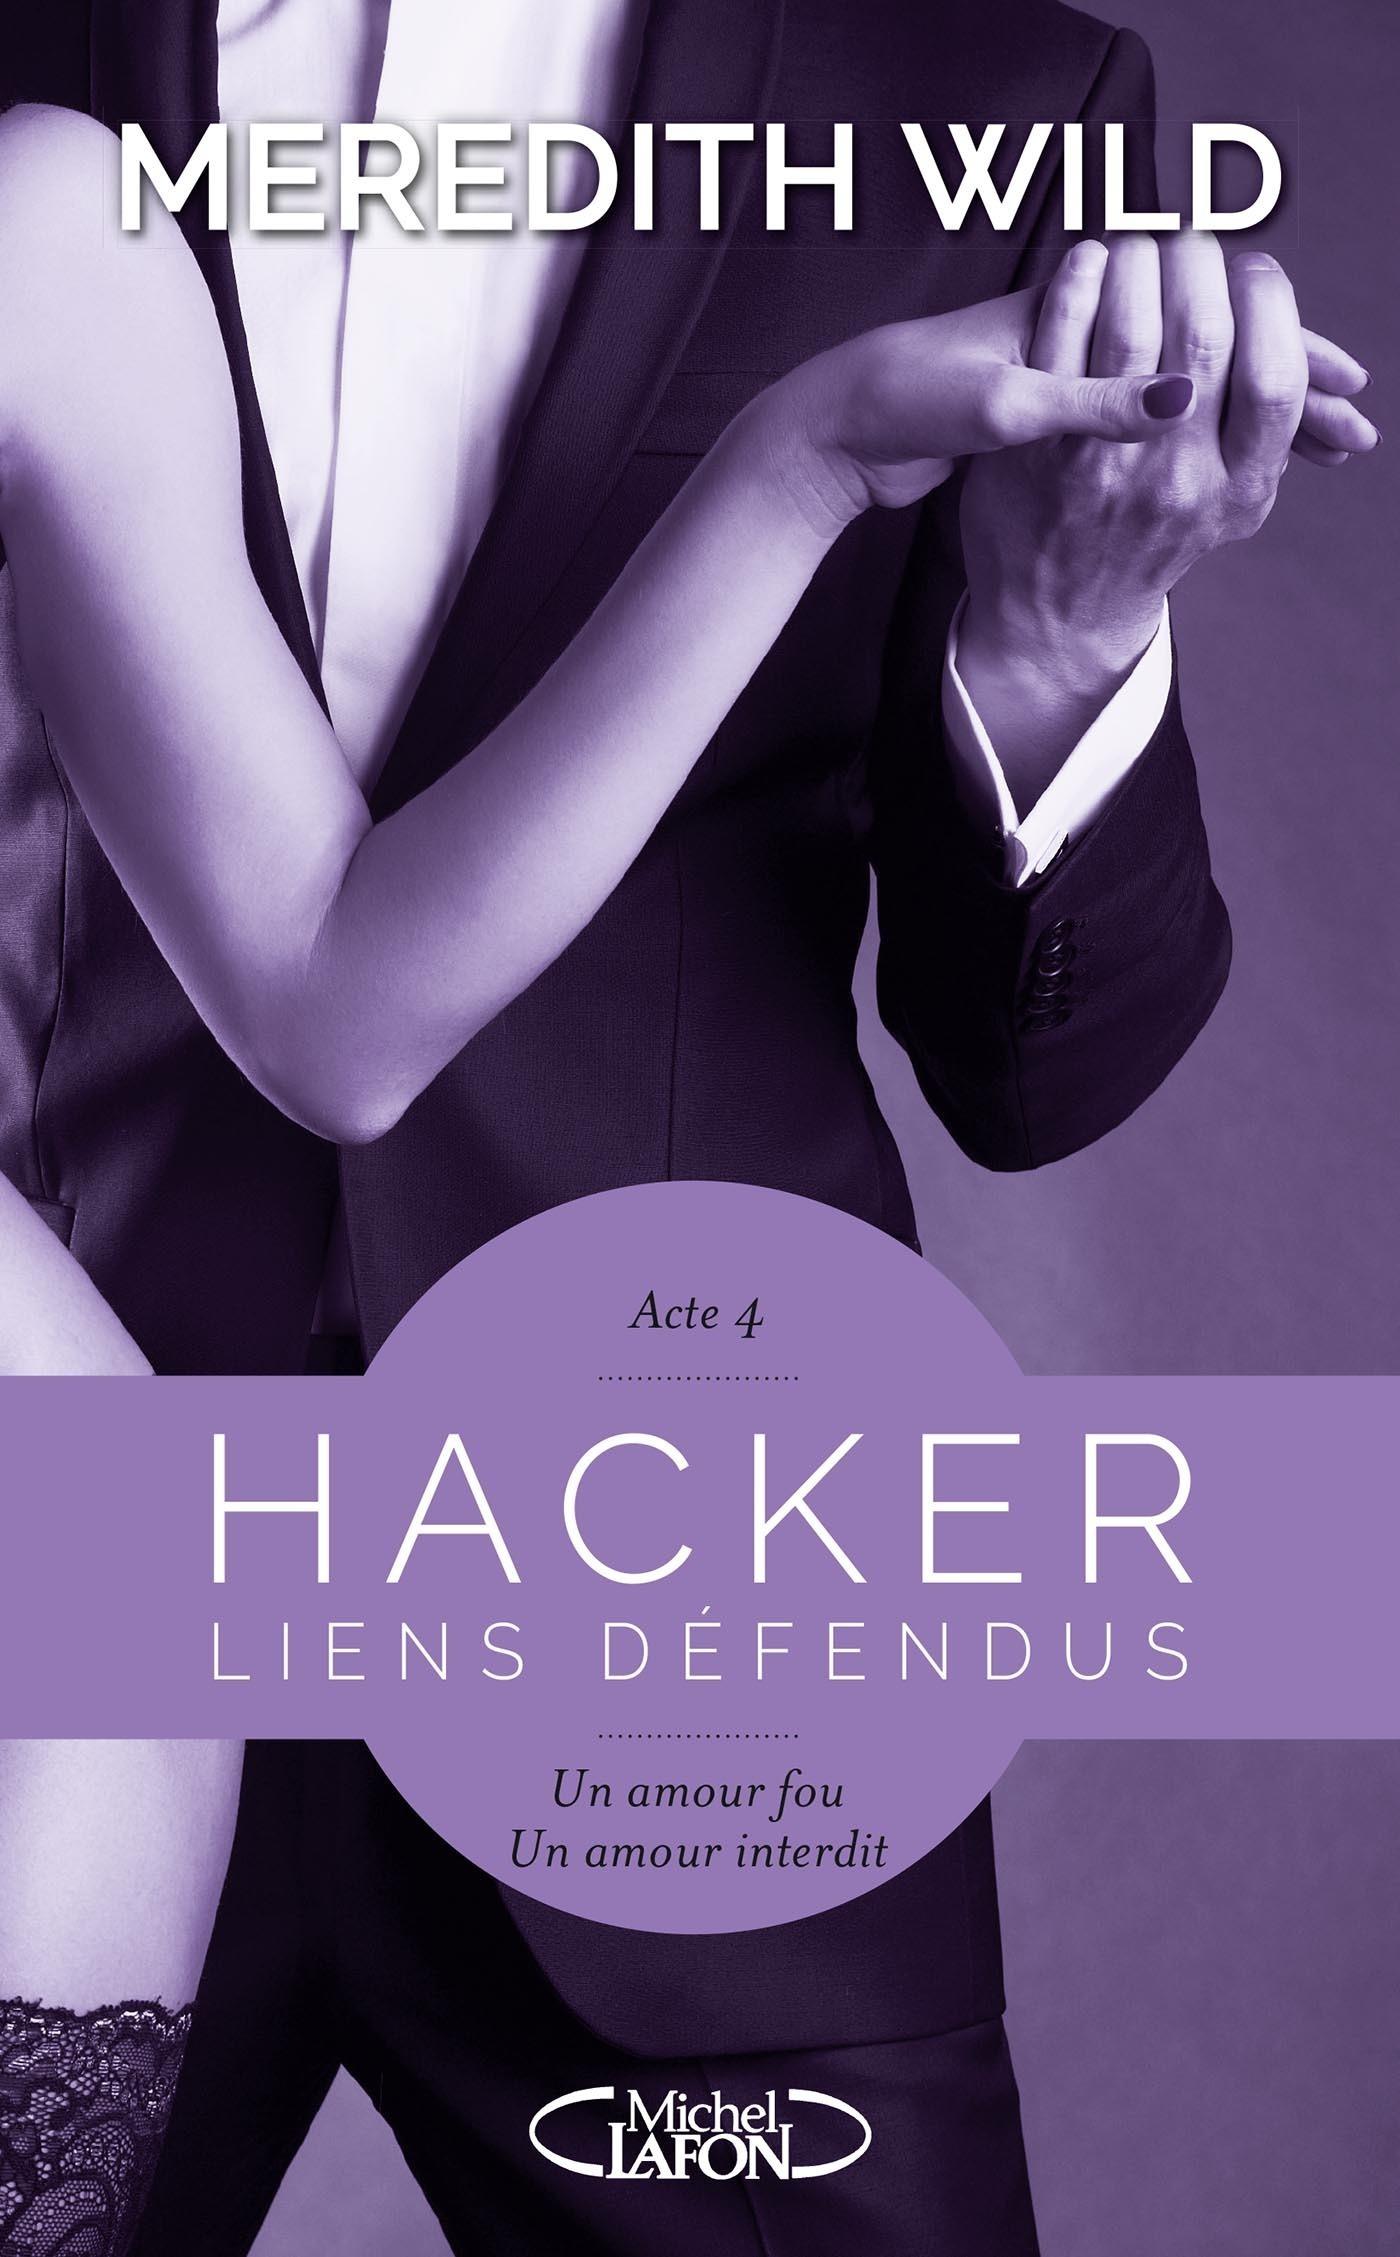 Hacker Acte 4 Liens défendus (ebook)